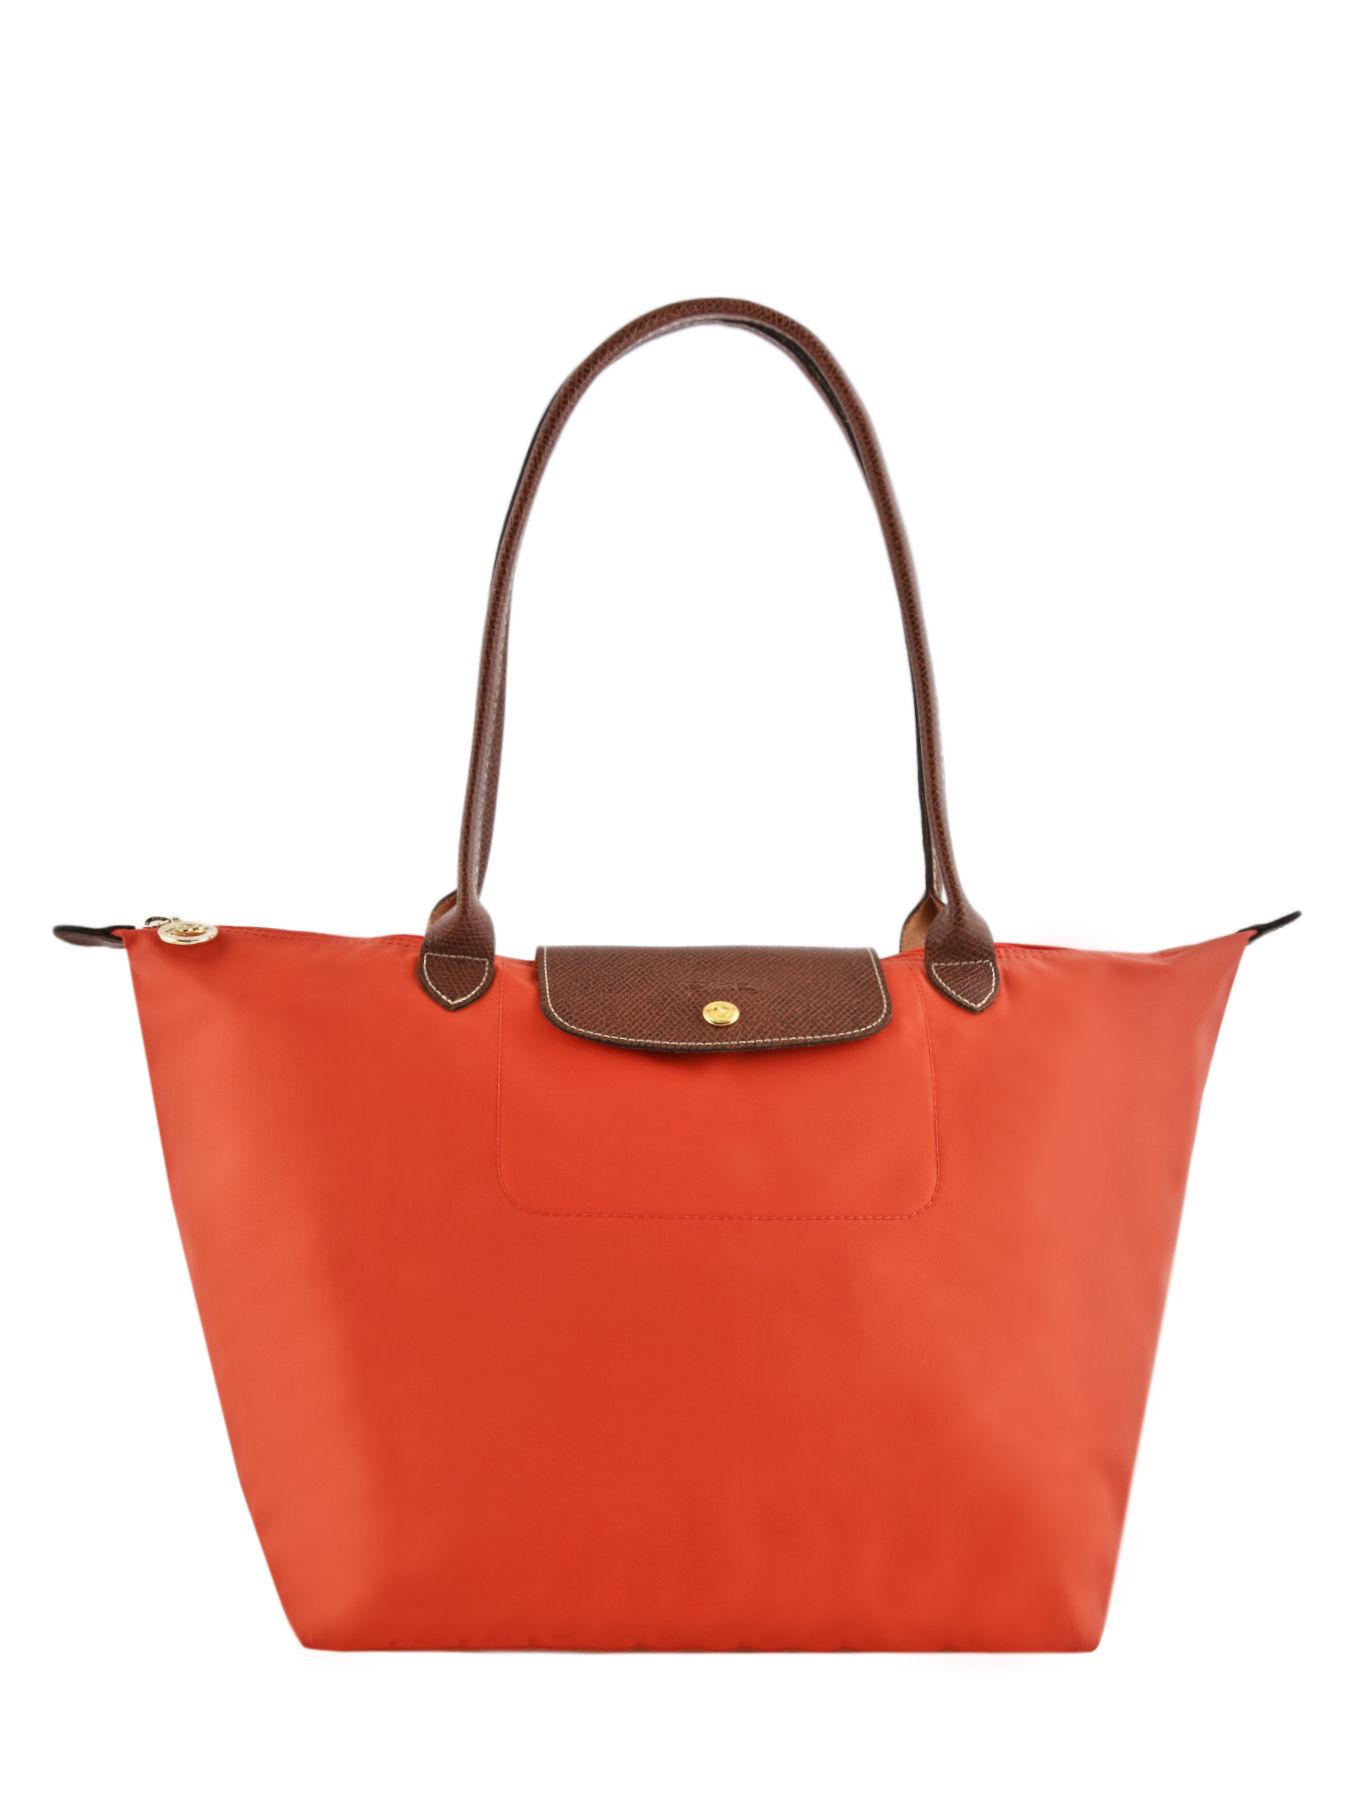 Besaces Longchamp Orange Besaces Besaces Besaces Orange Orange Longchamp Longchamp Longchamp x0qap8vRnw